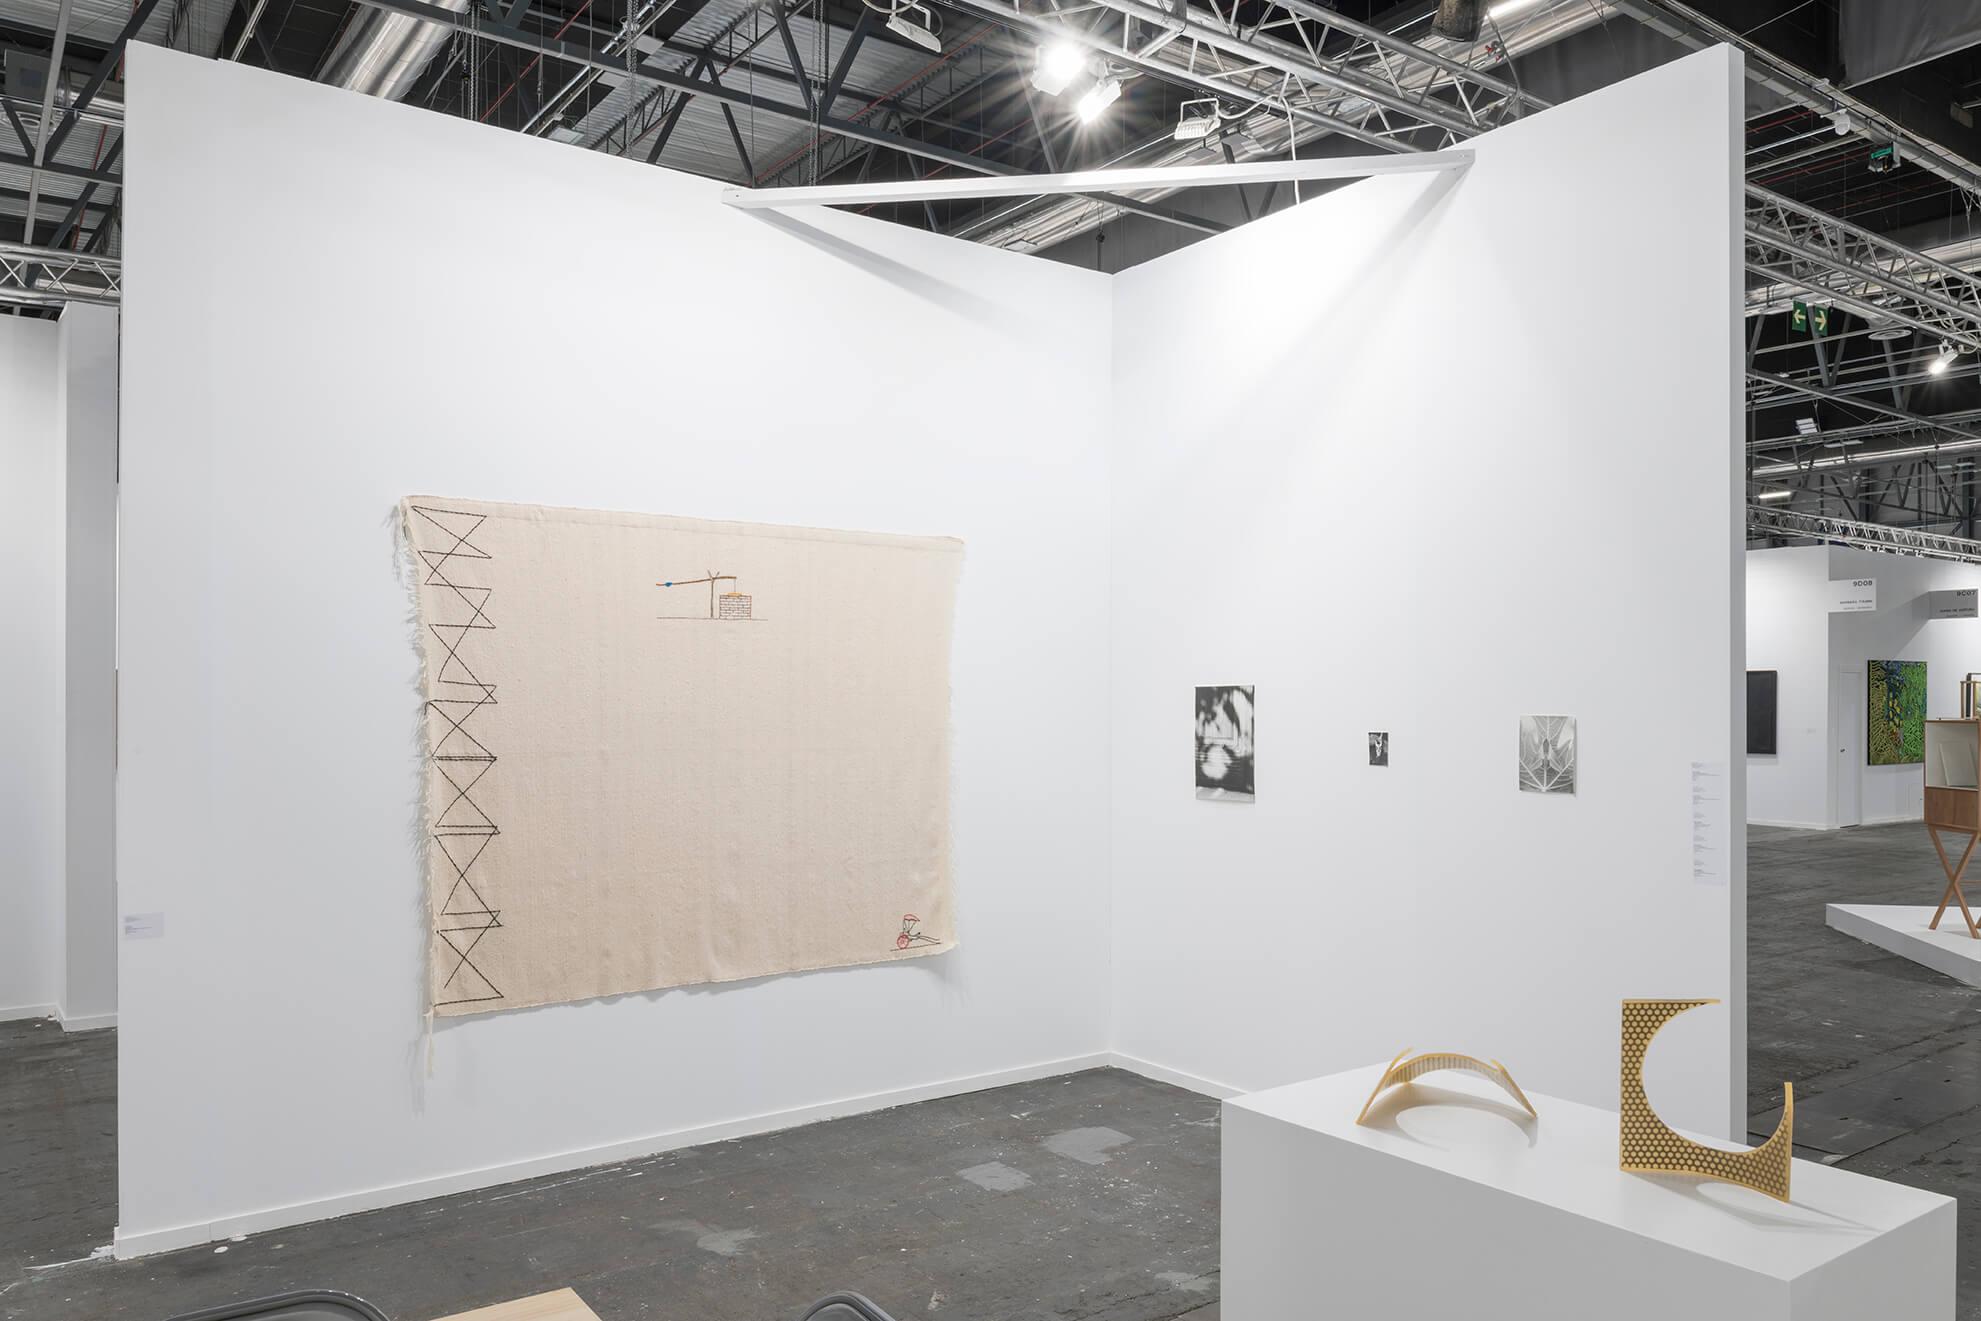 ProjecteSD, Booth 9D11 | ARCO 2020 | ProjecteSD